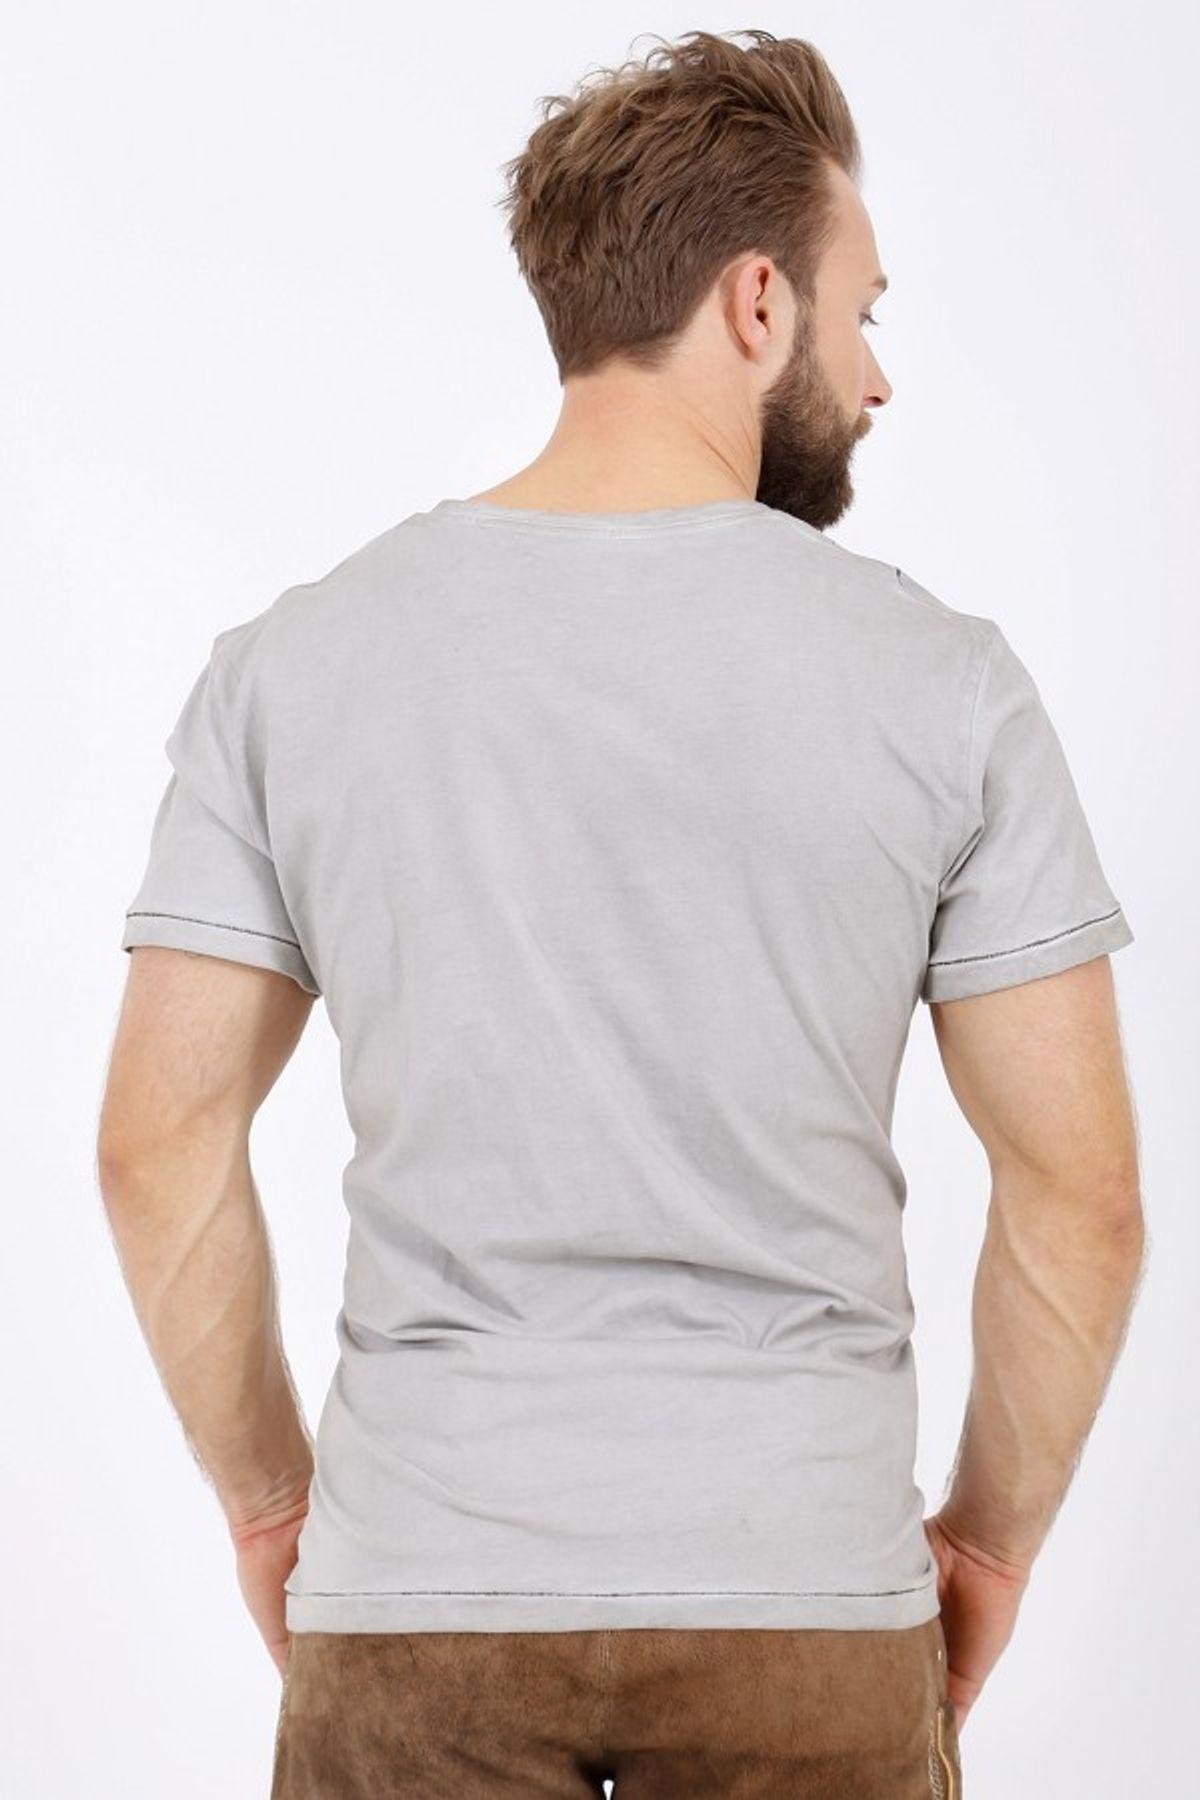 Krüger - Herren Trachten T-Shirt, Jäger Grau (95213-43) – Bild 5